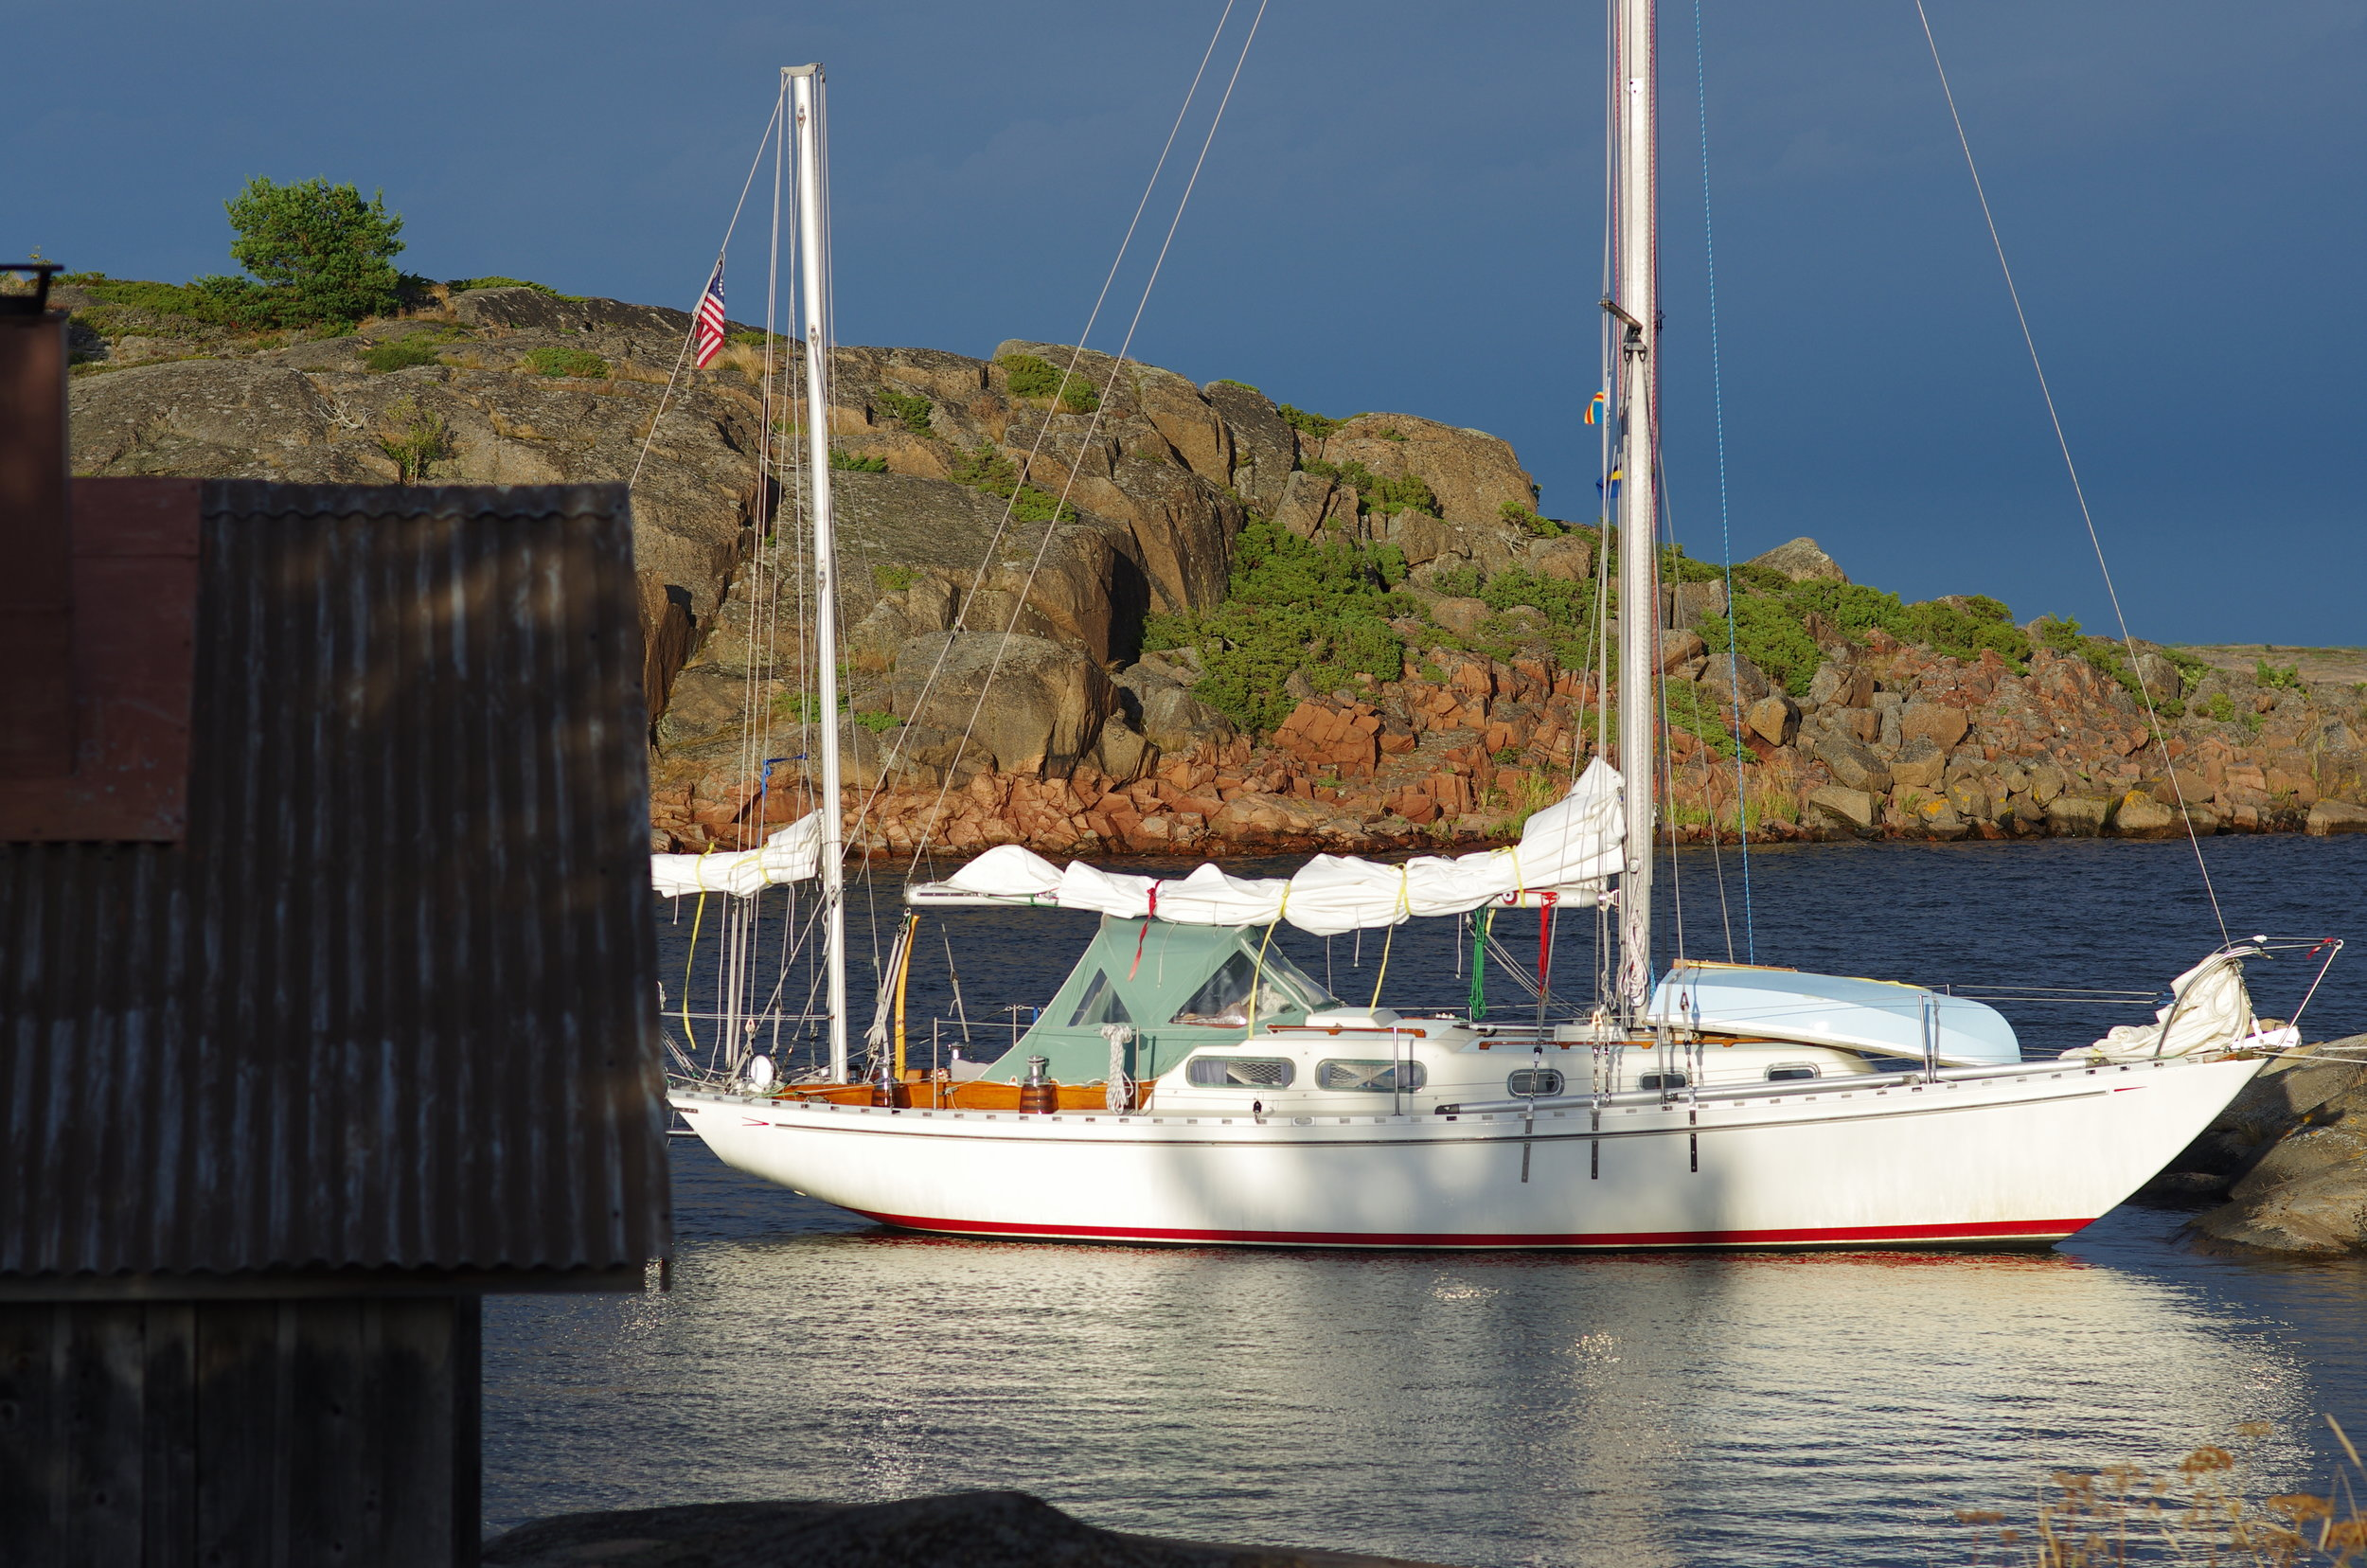 Mia & I sailed Arcturus to the Finnish Åland archipelago in summer 2014.